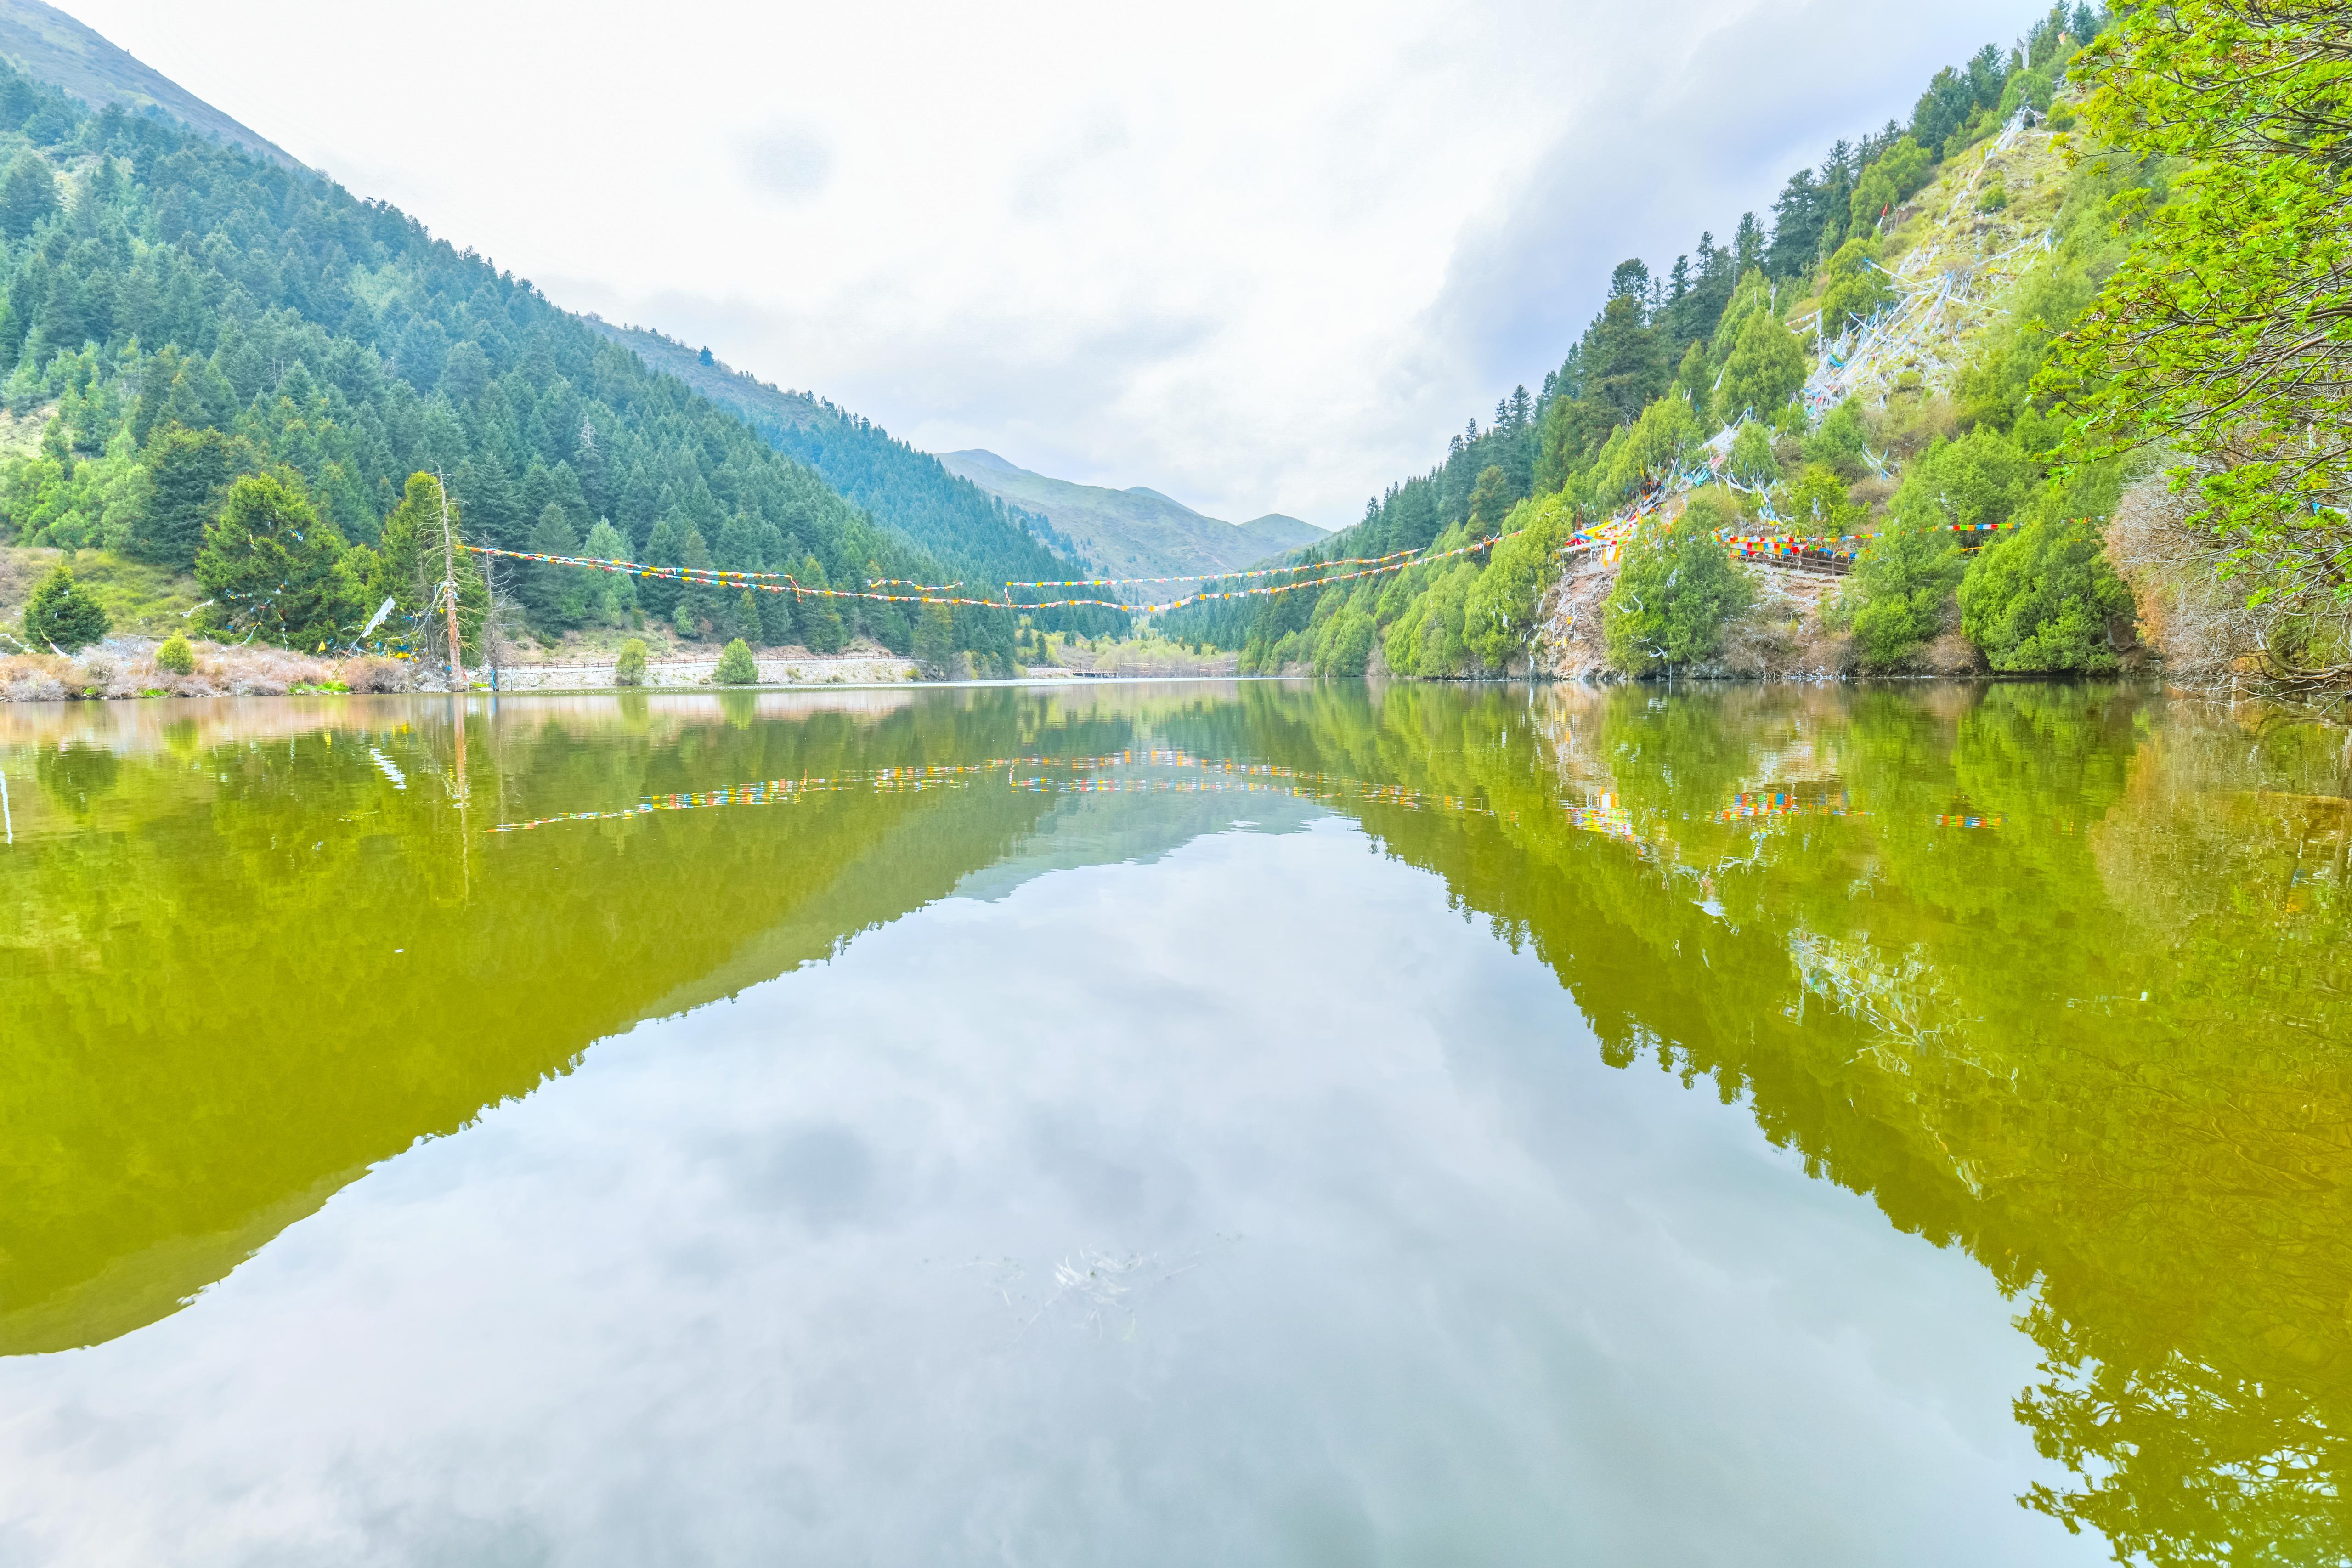 Dazong Lake